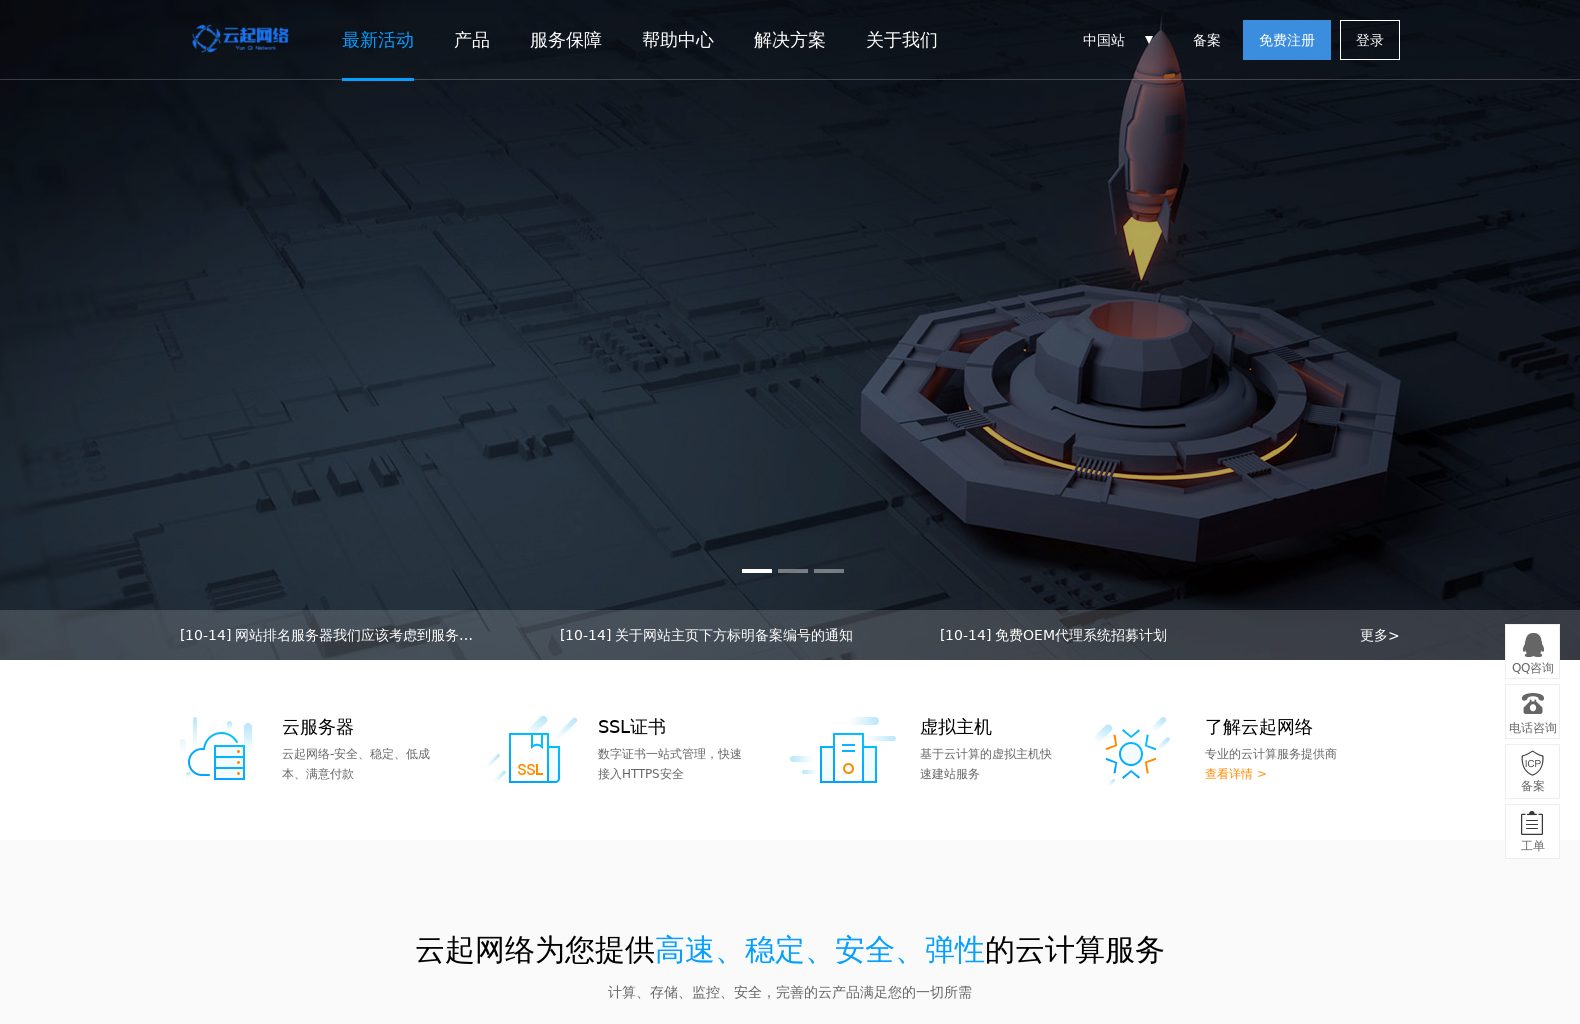 tkvm.cn网站截图